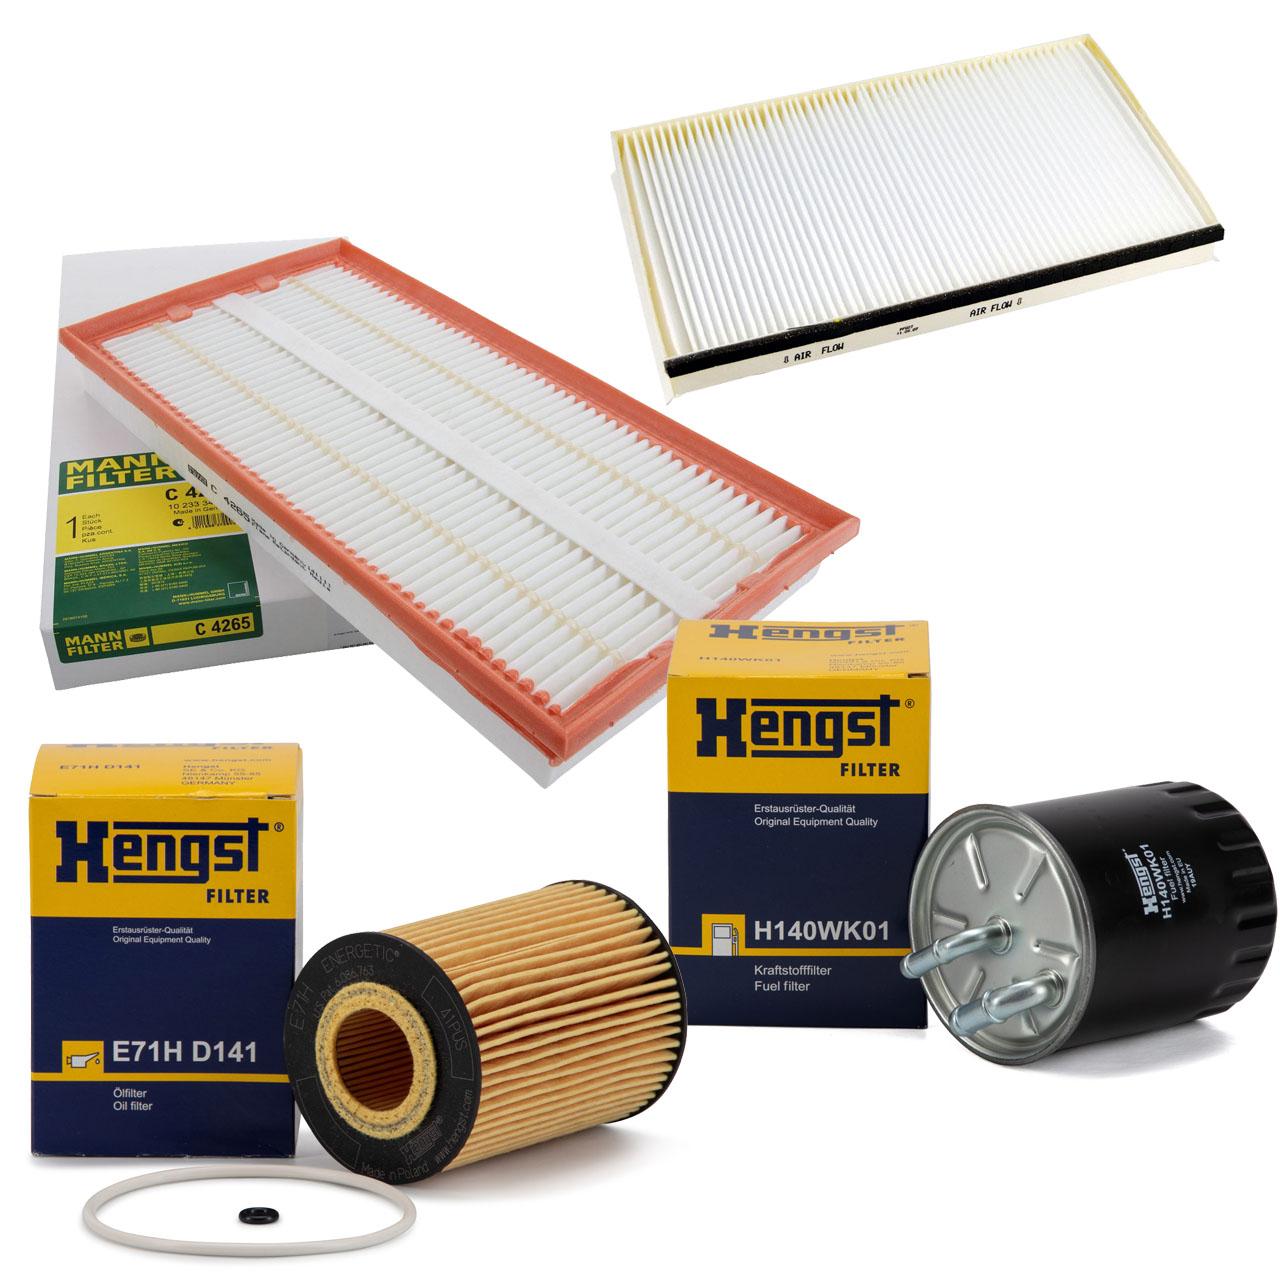 Inspektionskit 4-tlg MERCEDES VIANO CDI 3.0 VITO / MIXTO 120/122 CDI W639 OM642